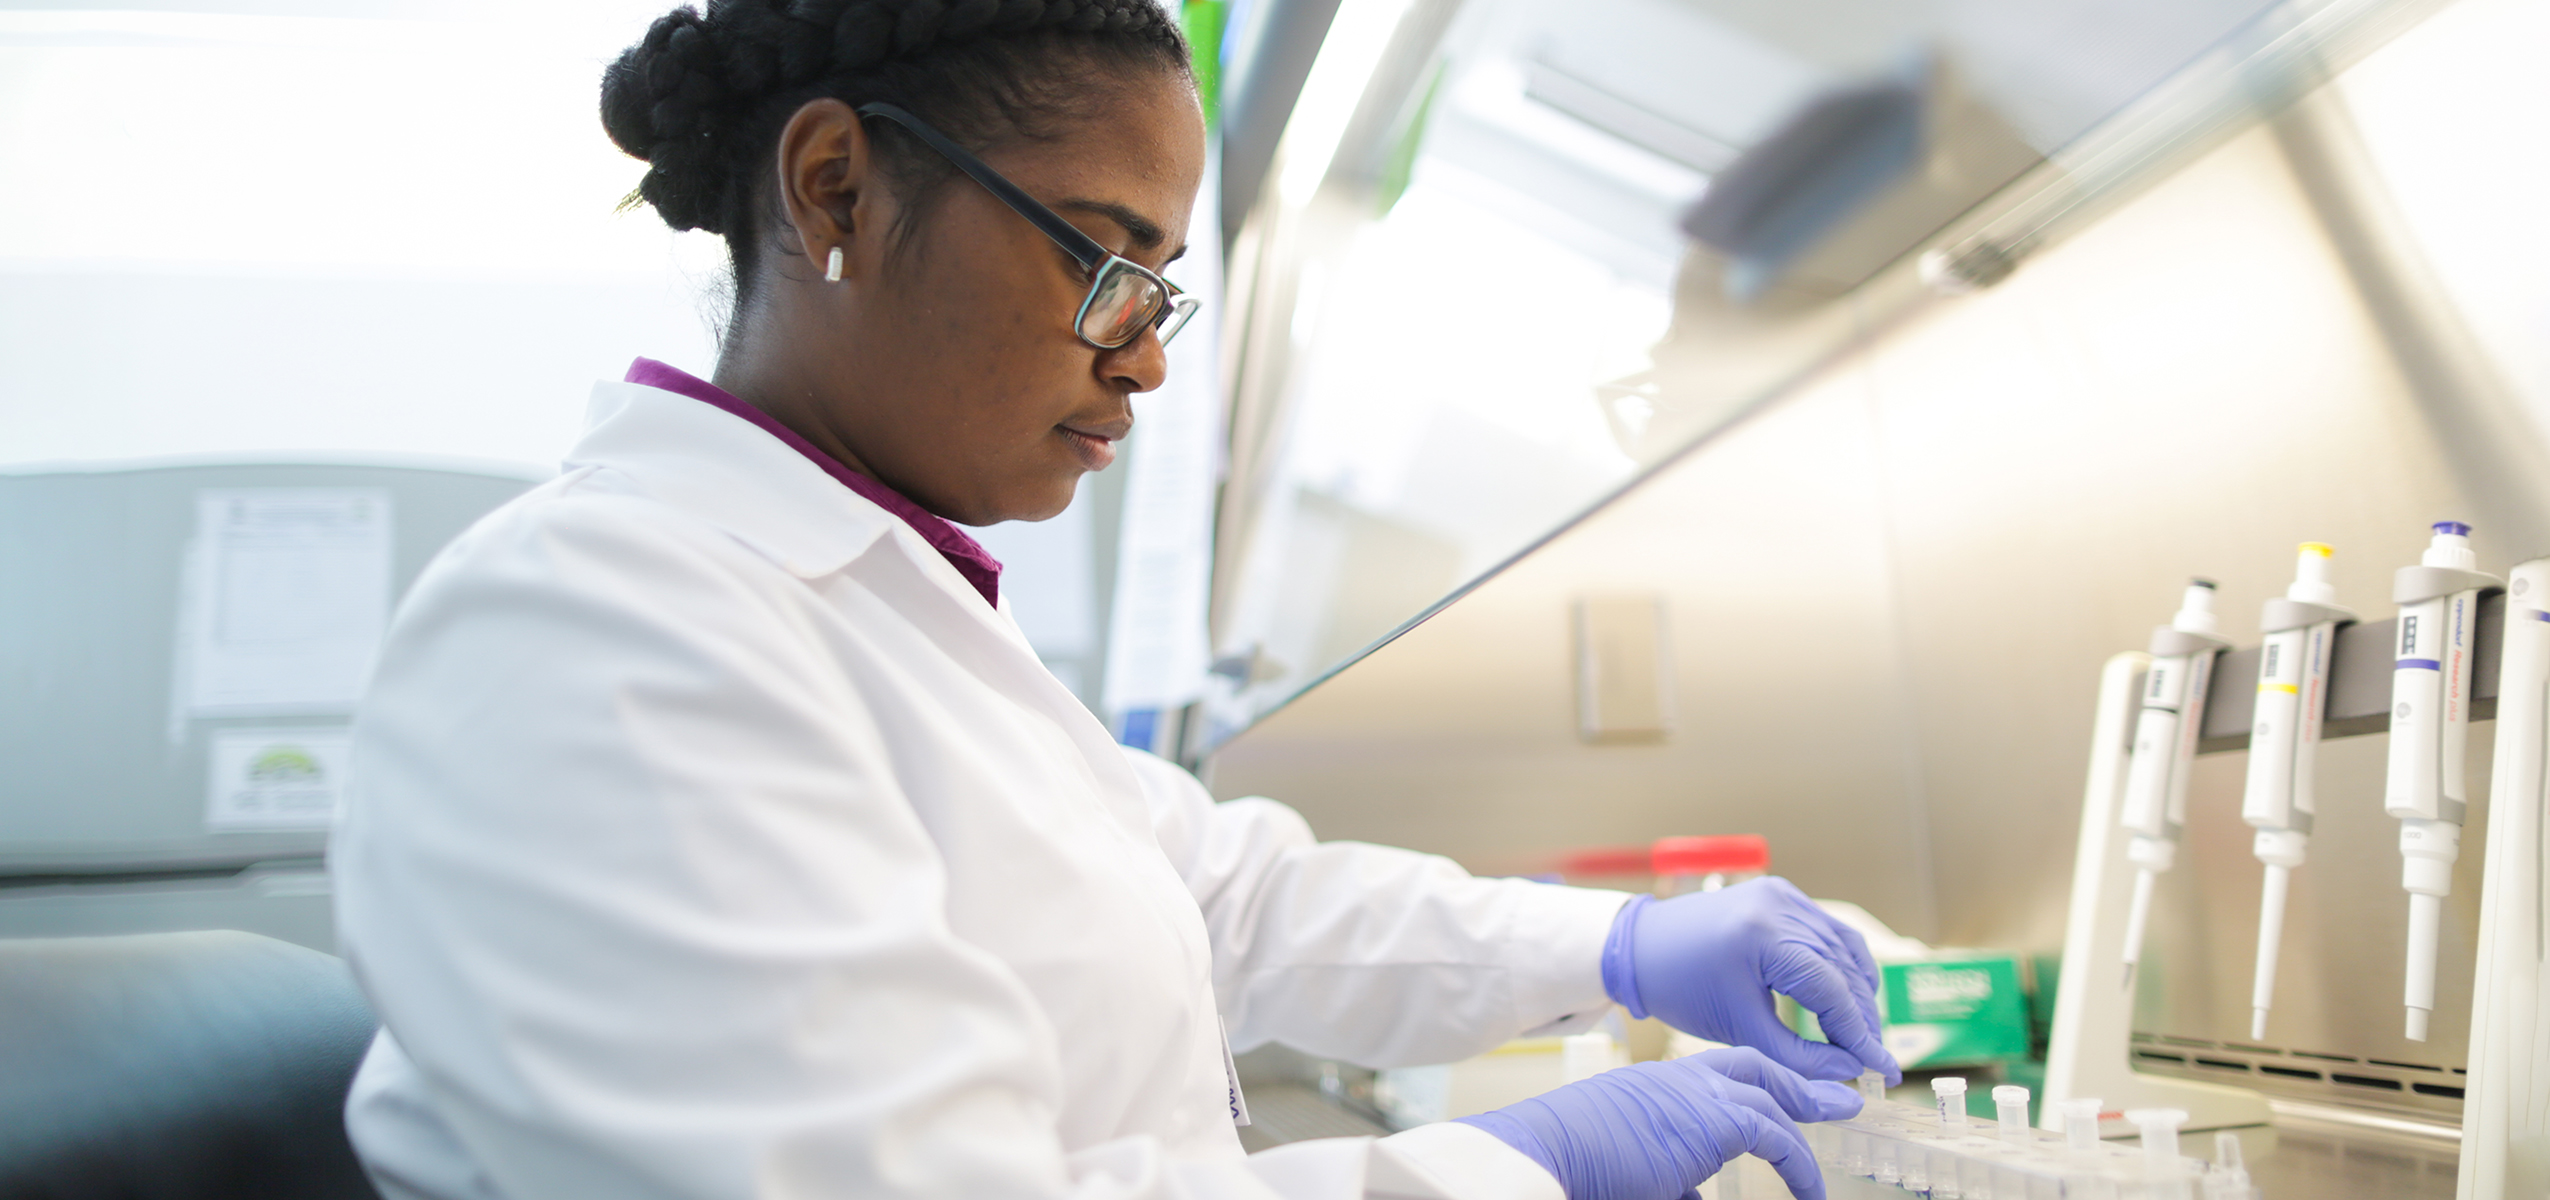 IDB ready to help member countries address coronavirus